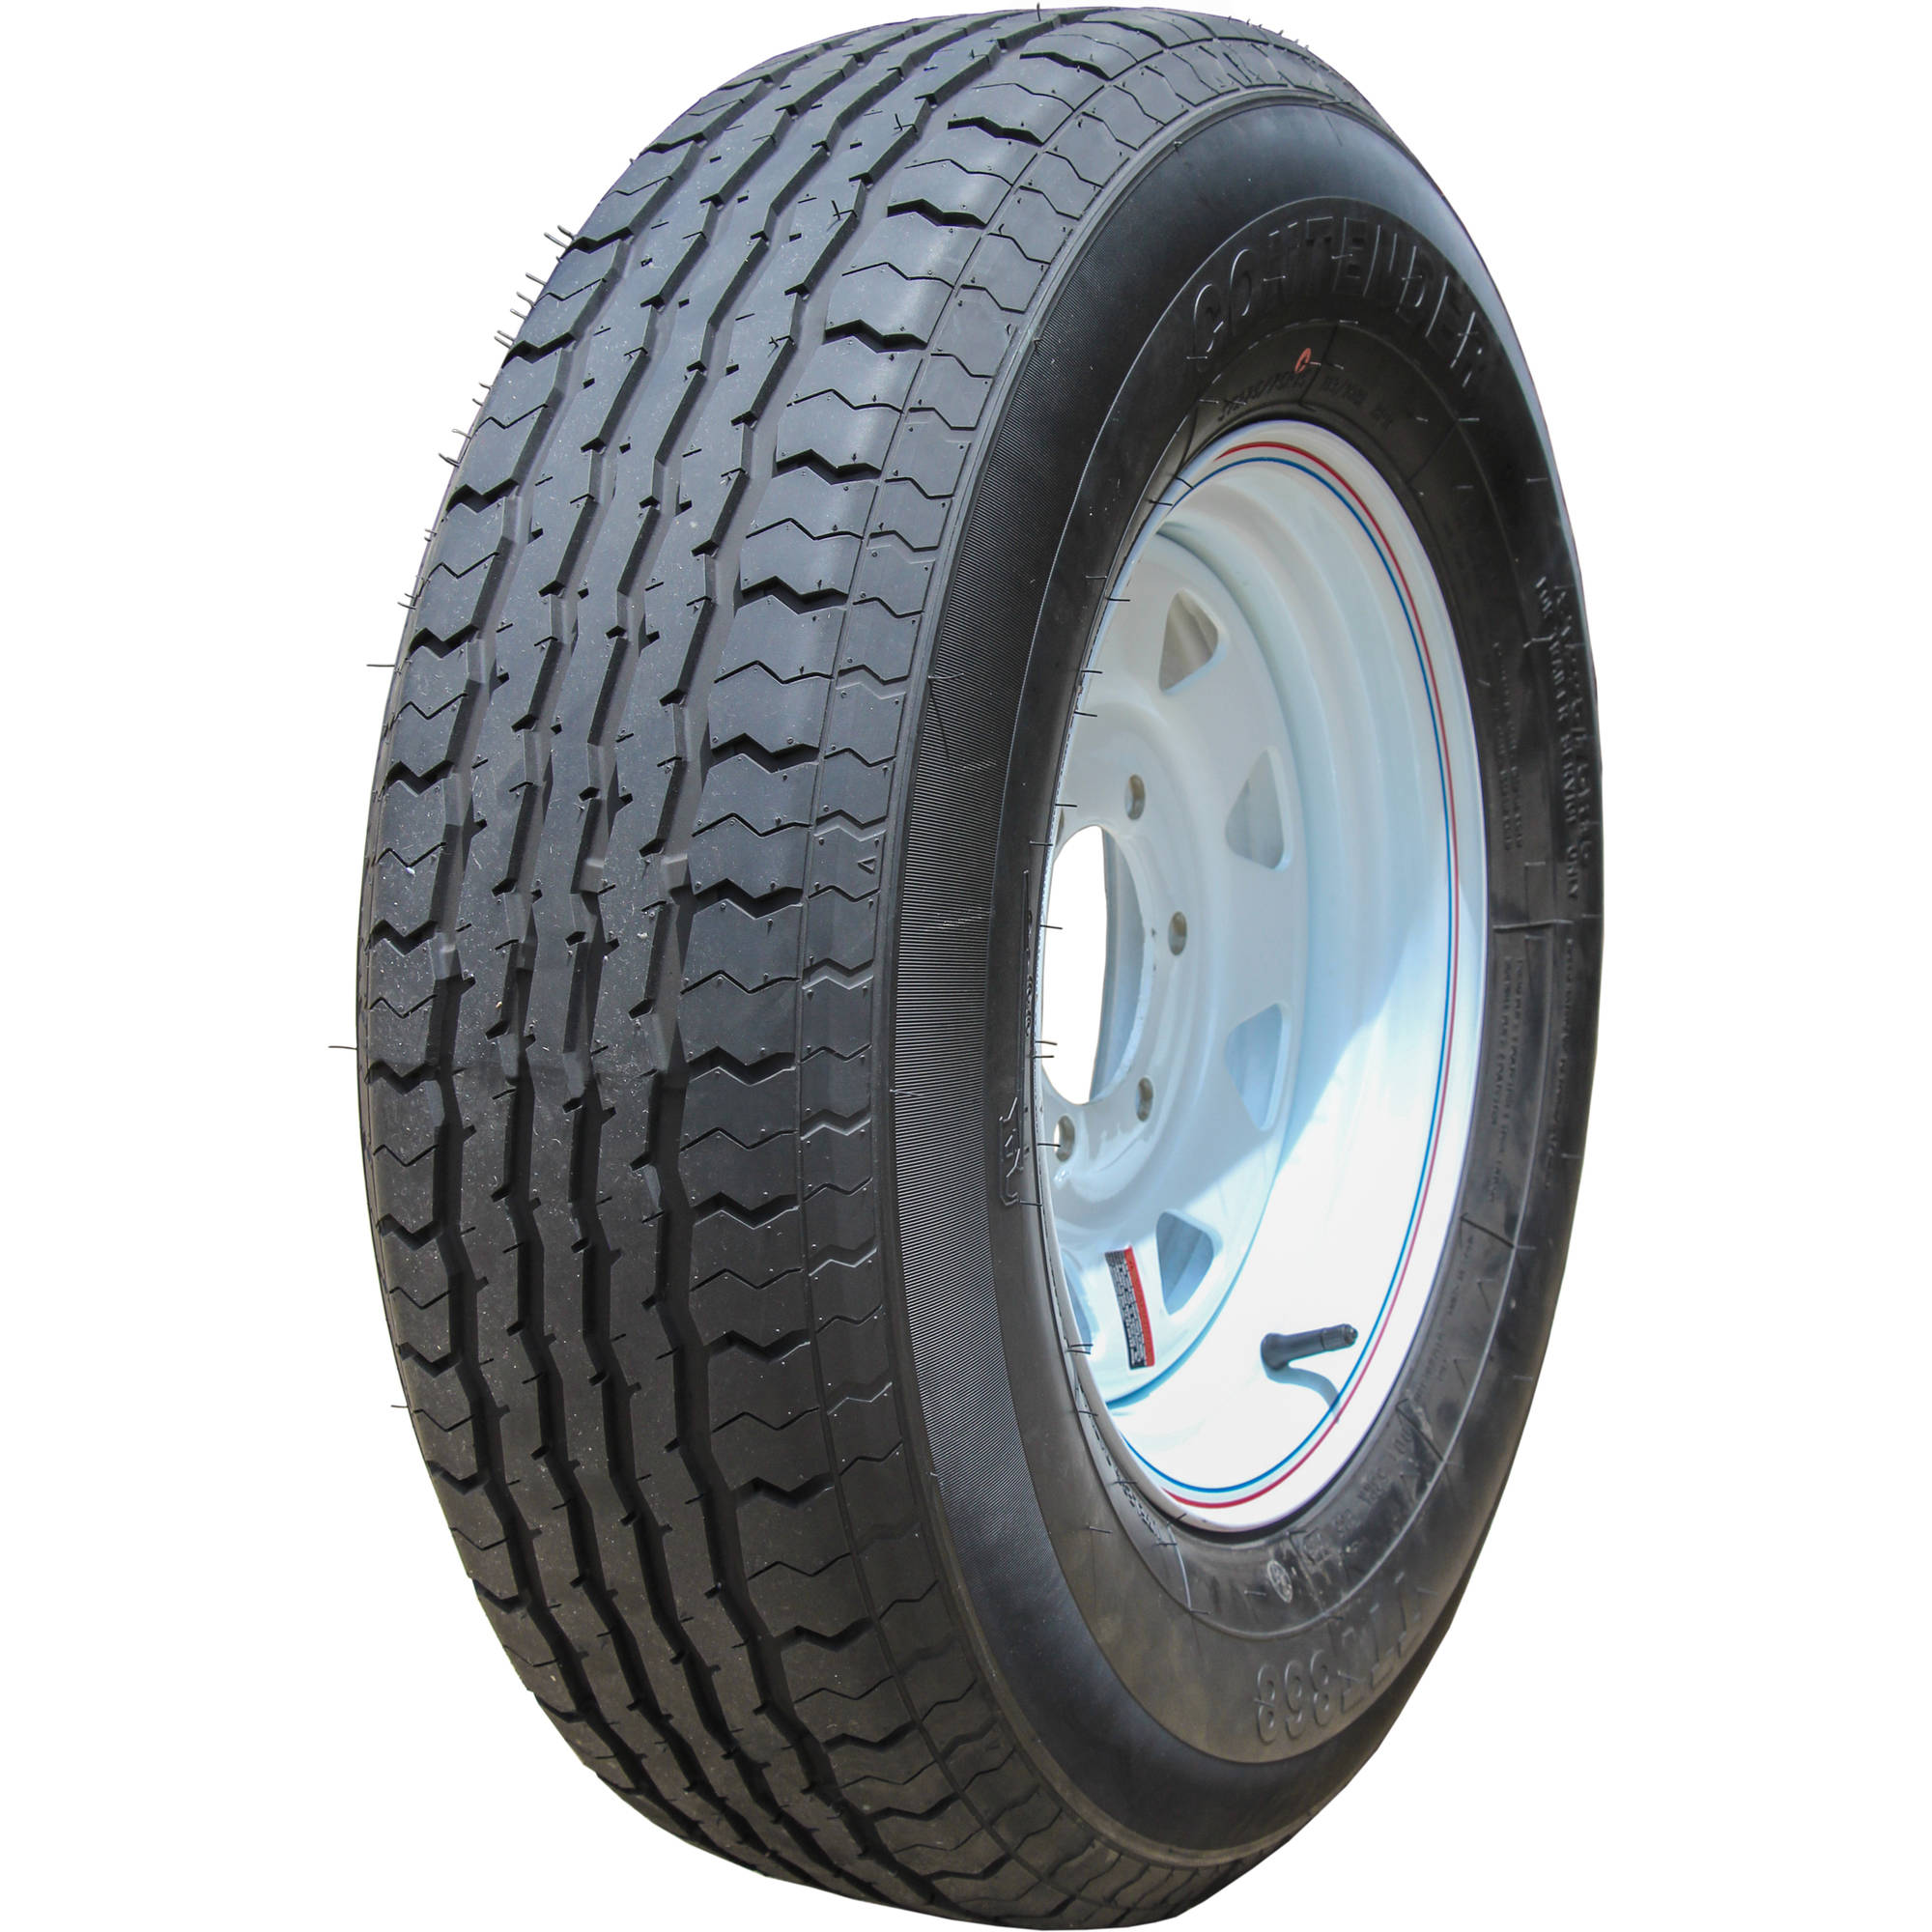 contender st225 75r15 load range d trailer tire fits 15 inch wheels tire only ebay. Black Bedroom Furniture Sets. Home Design Ideas